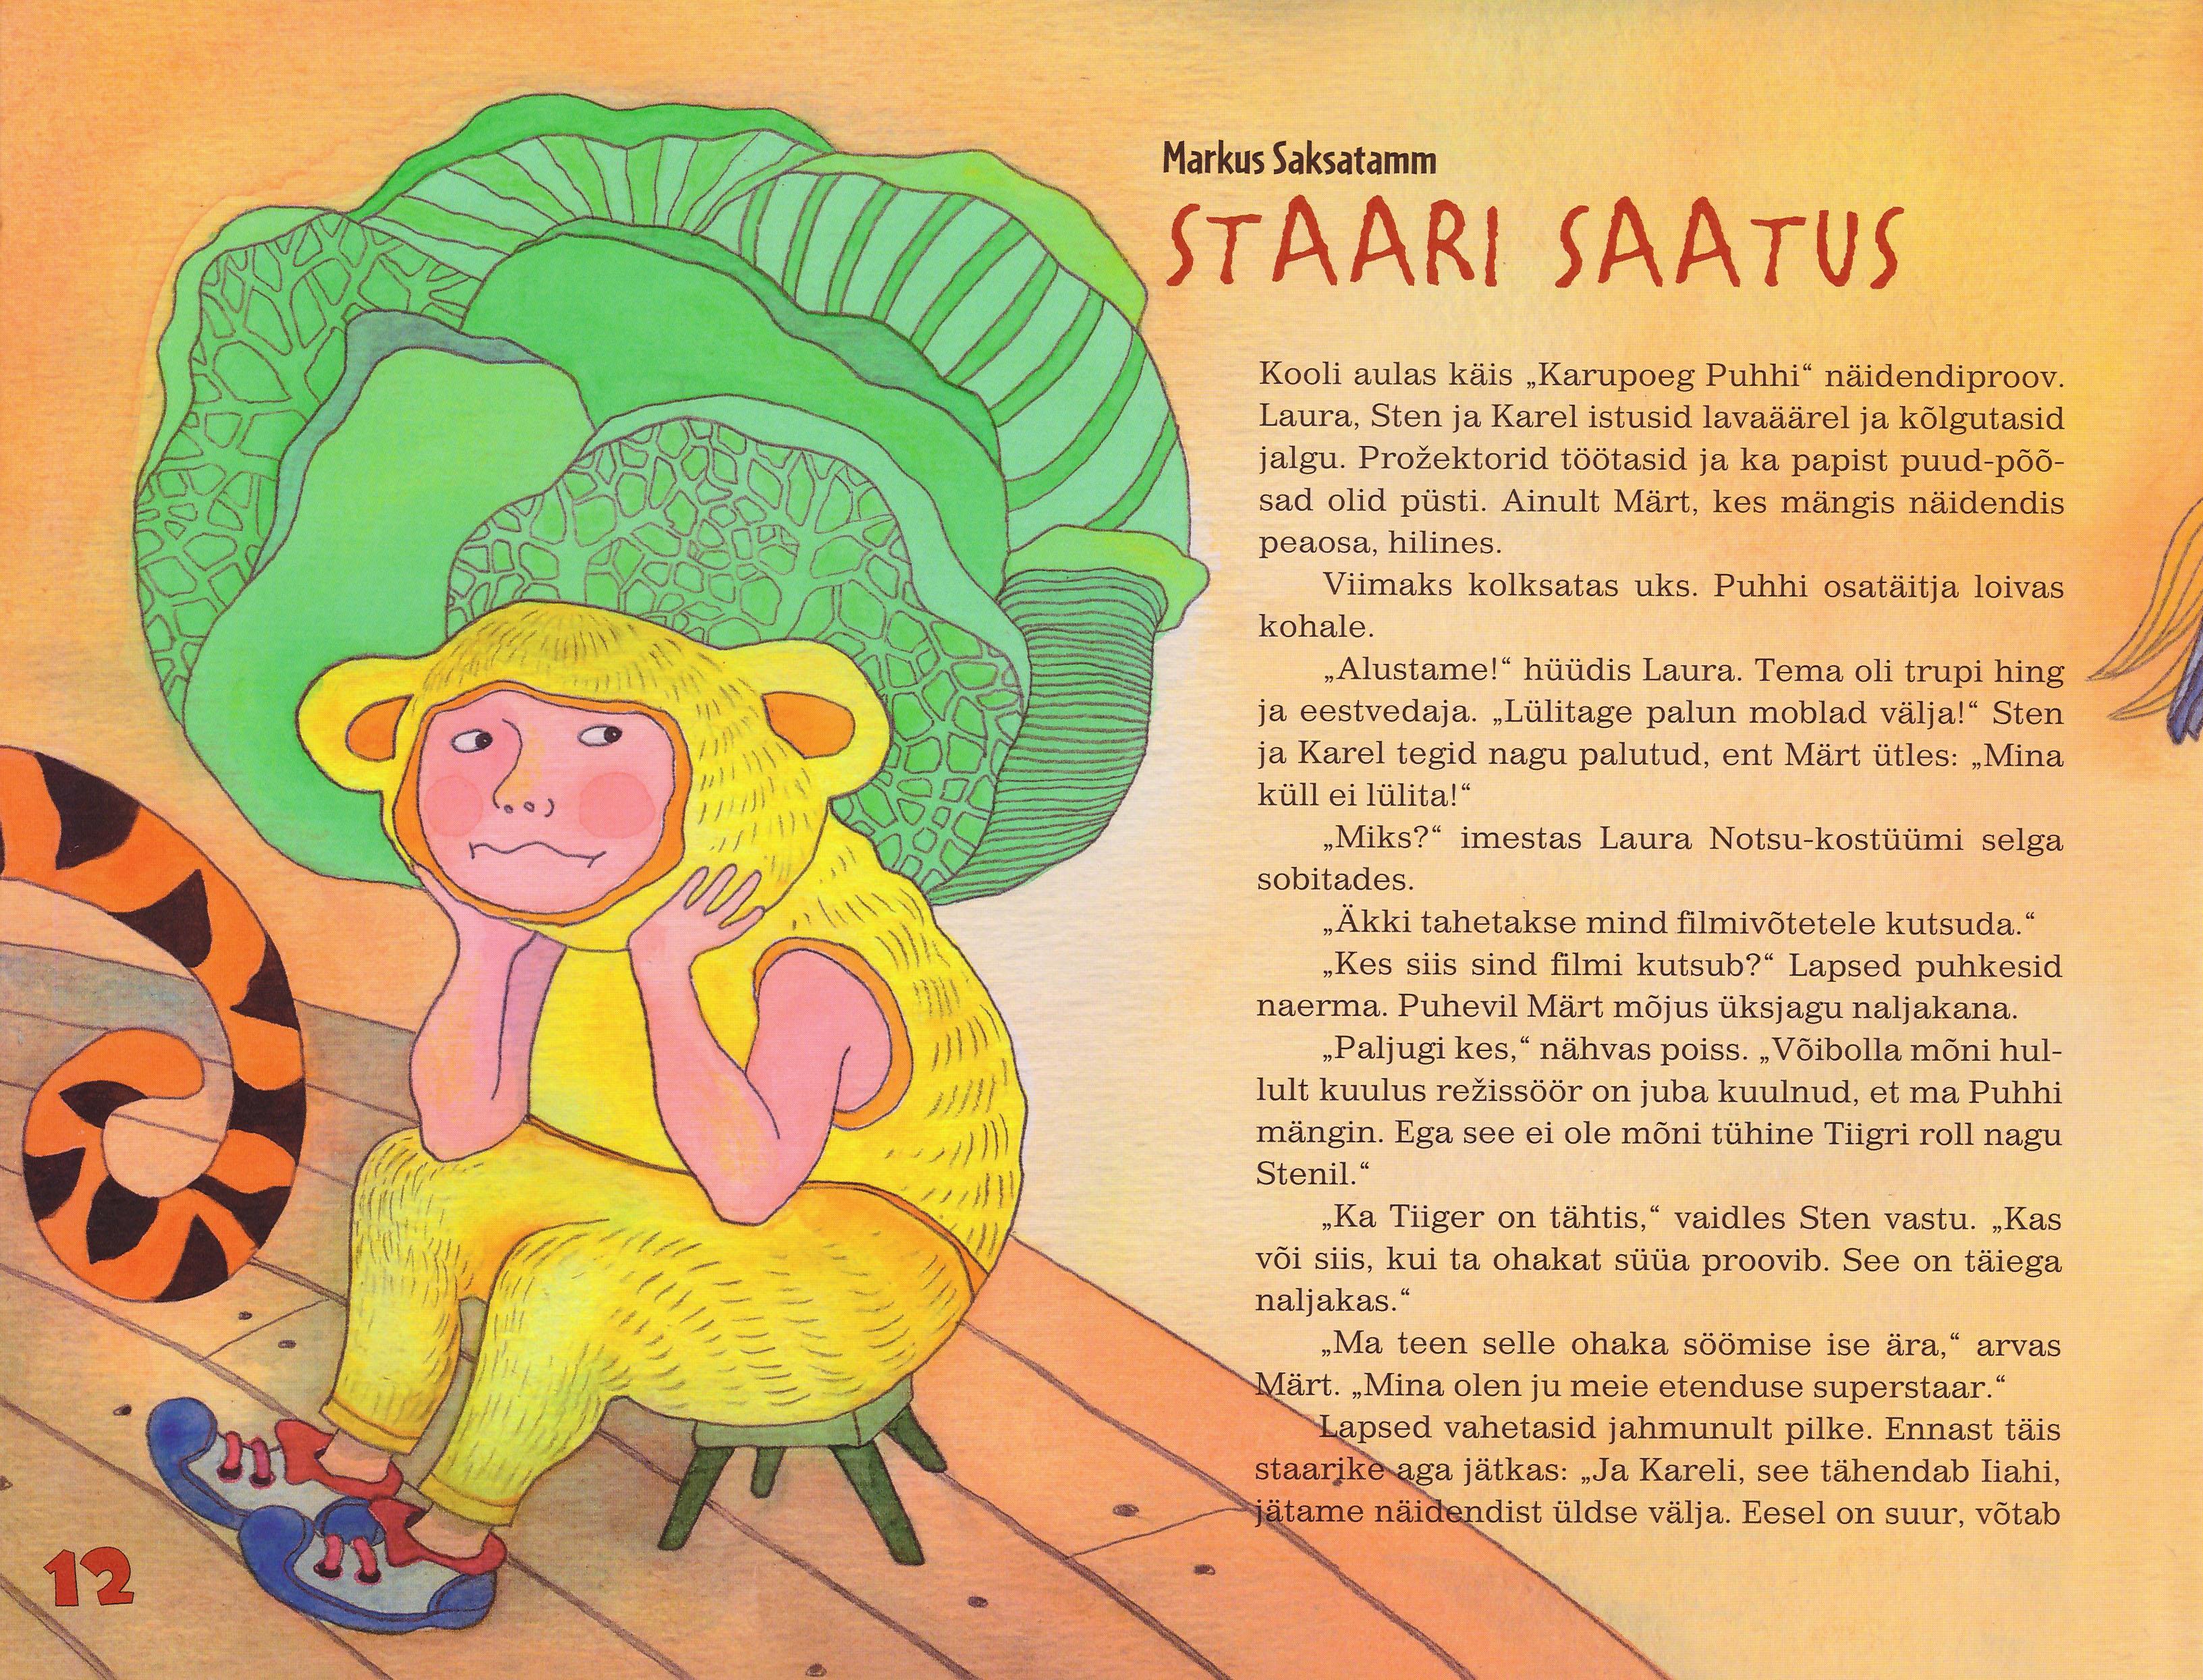 Illustrations for Children's magazine Täheke, March 2015. Aili Mittal-Jõgiste